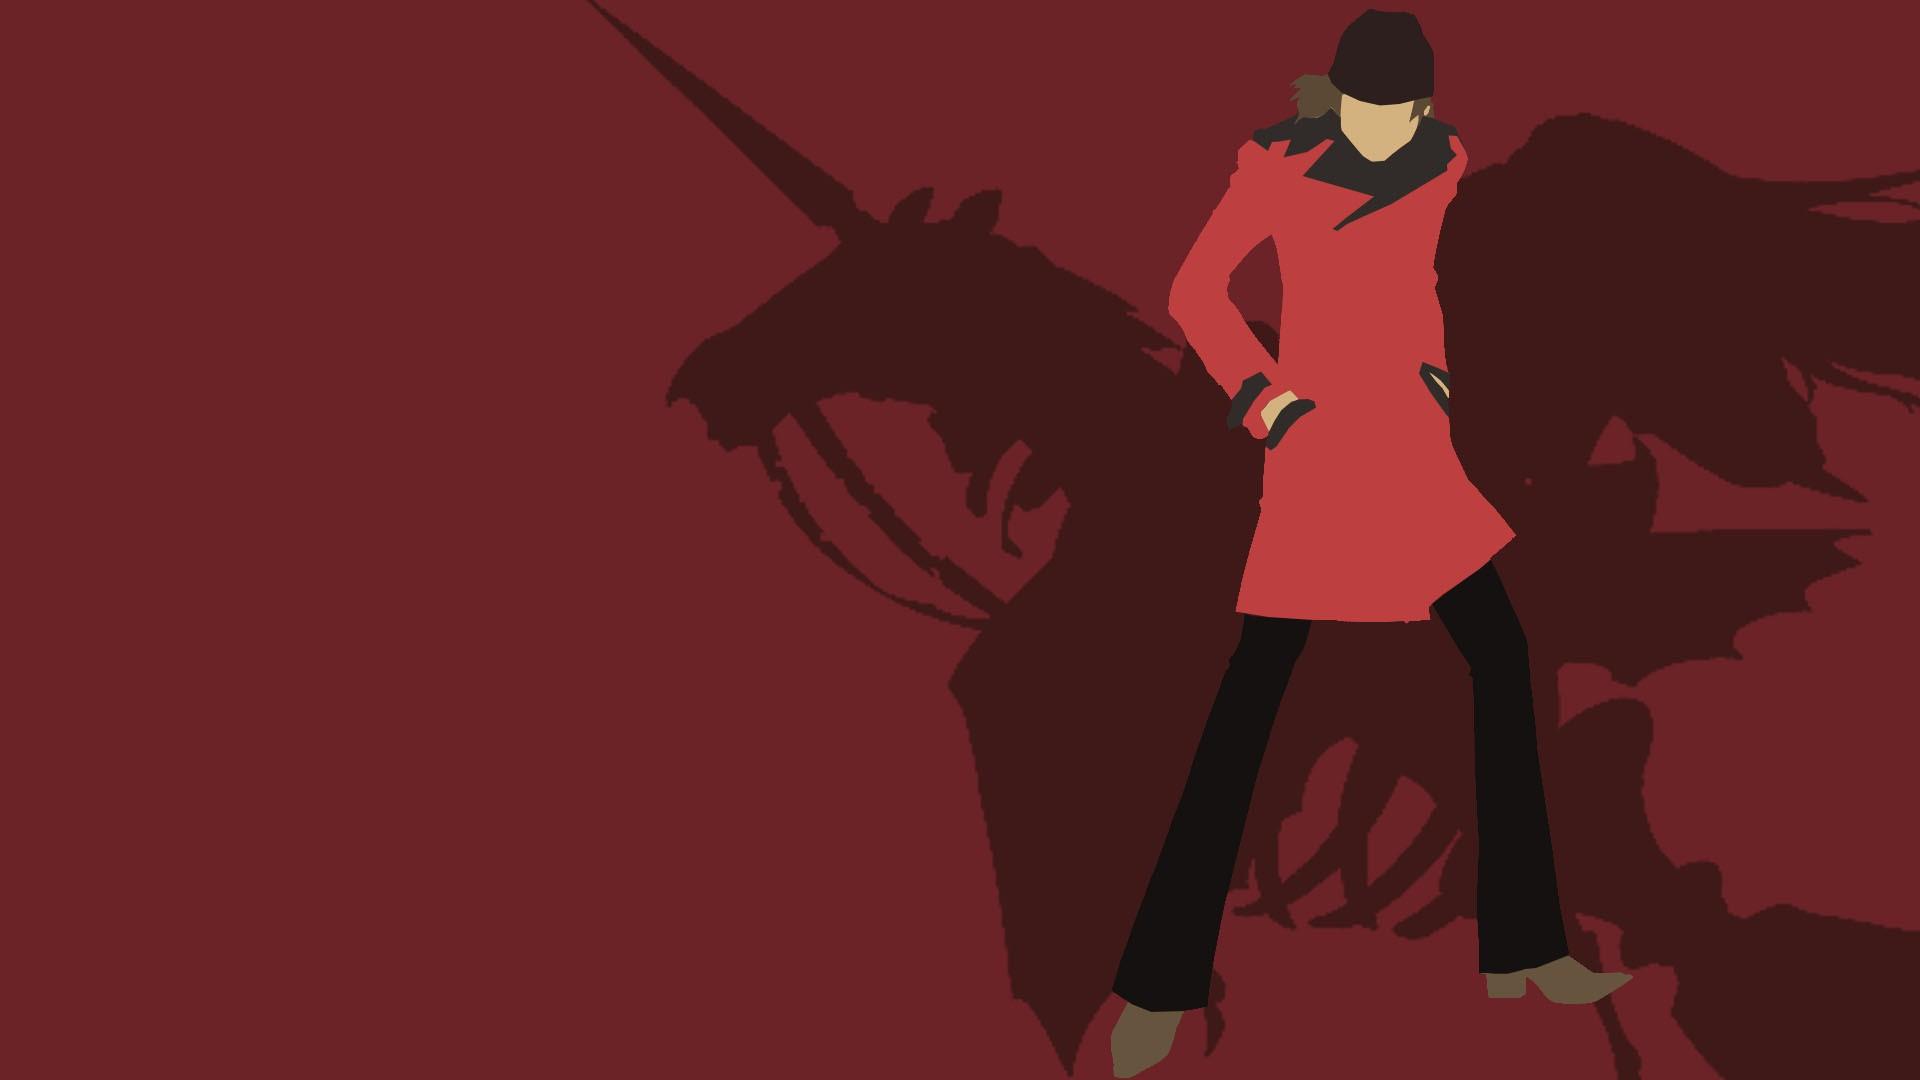 Illustration Cartoon Persona 3 Series Screenshot Fictional Character